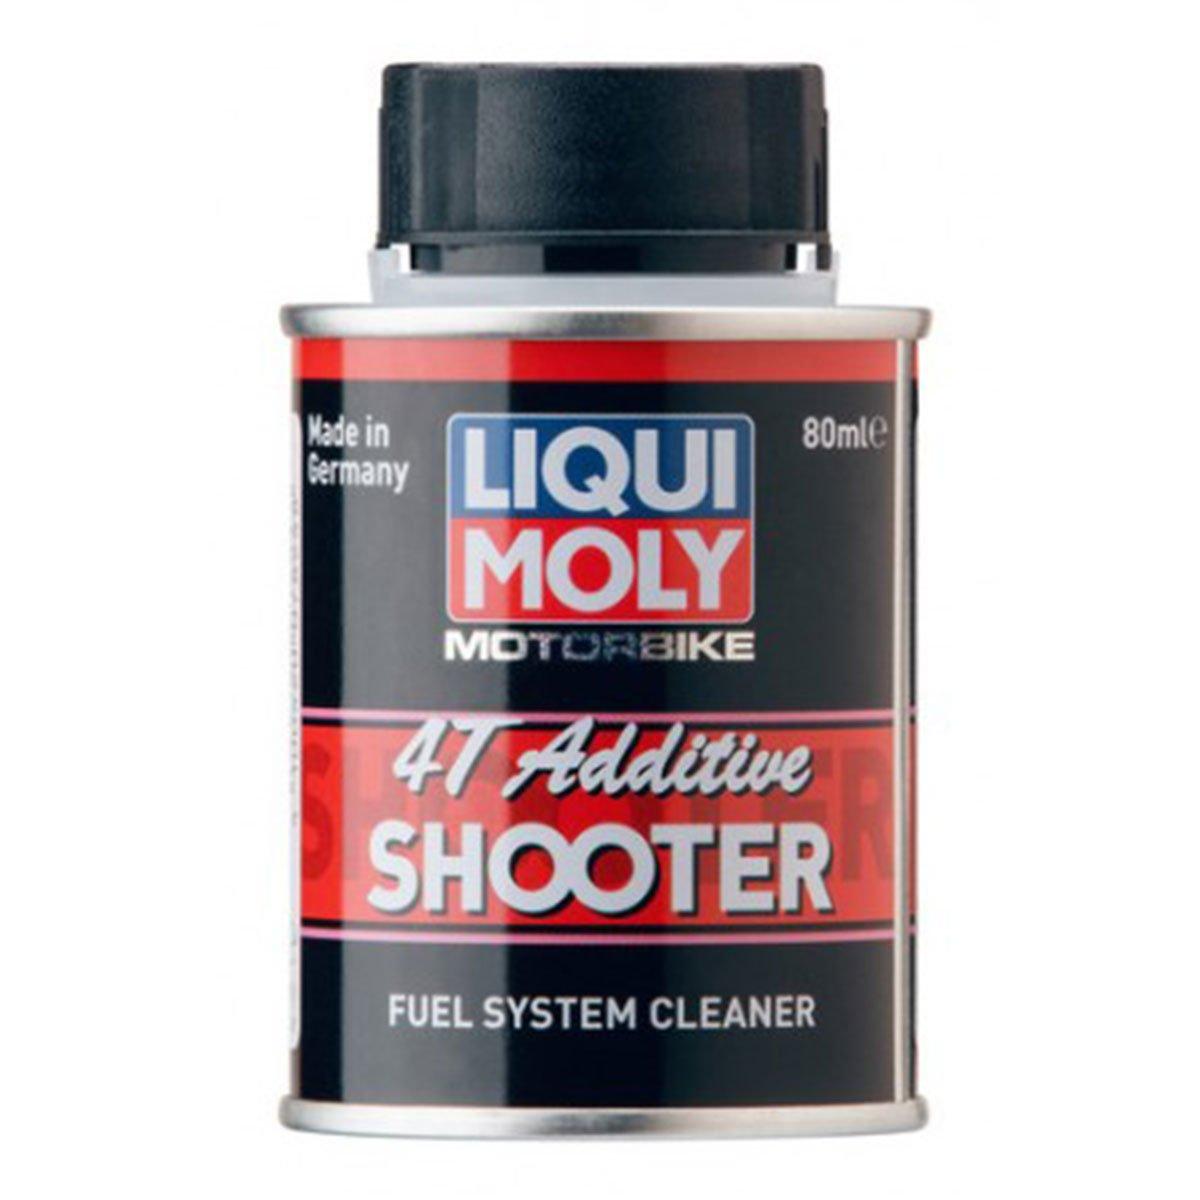 Liqui Moly Motorbike 4T-Additive Shooter 80ML